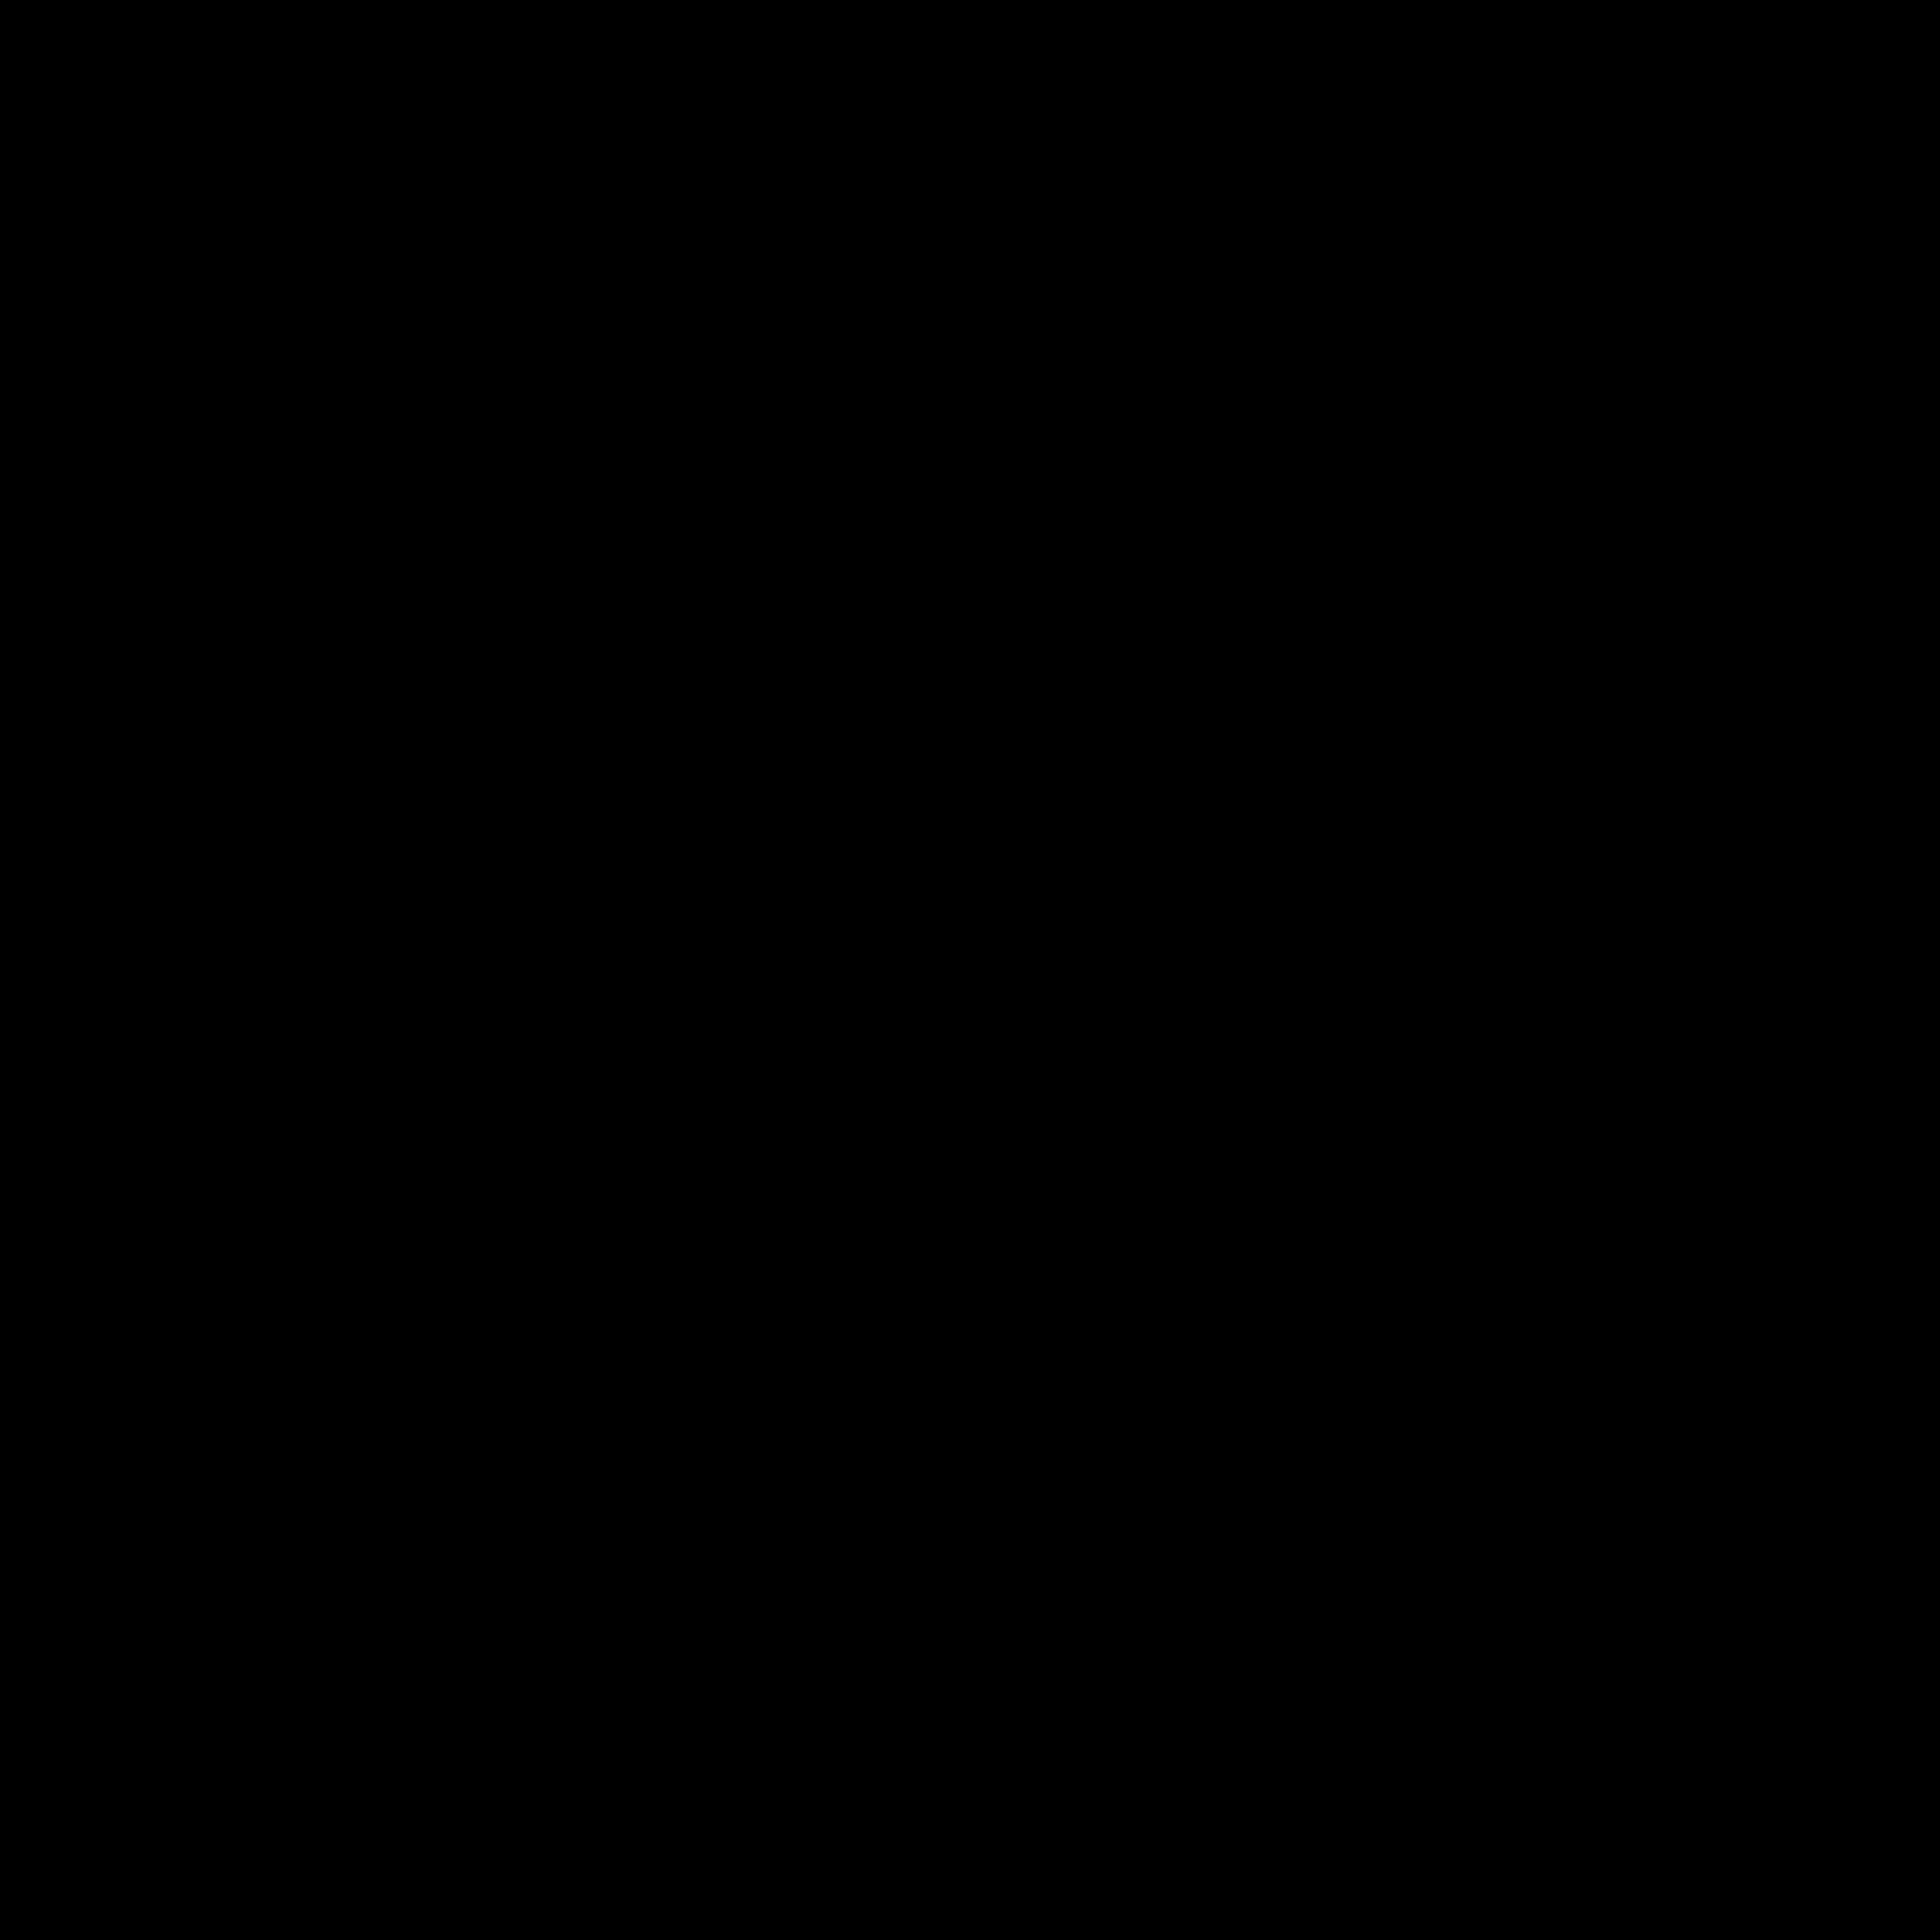 Louis Vuitton Logo Png Transparent Svg Vector Freebie Supply